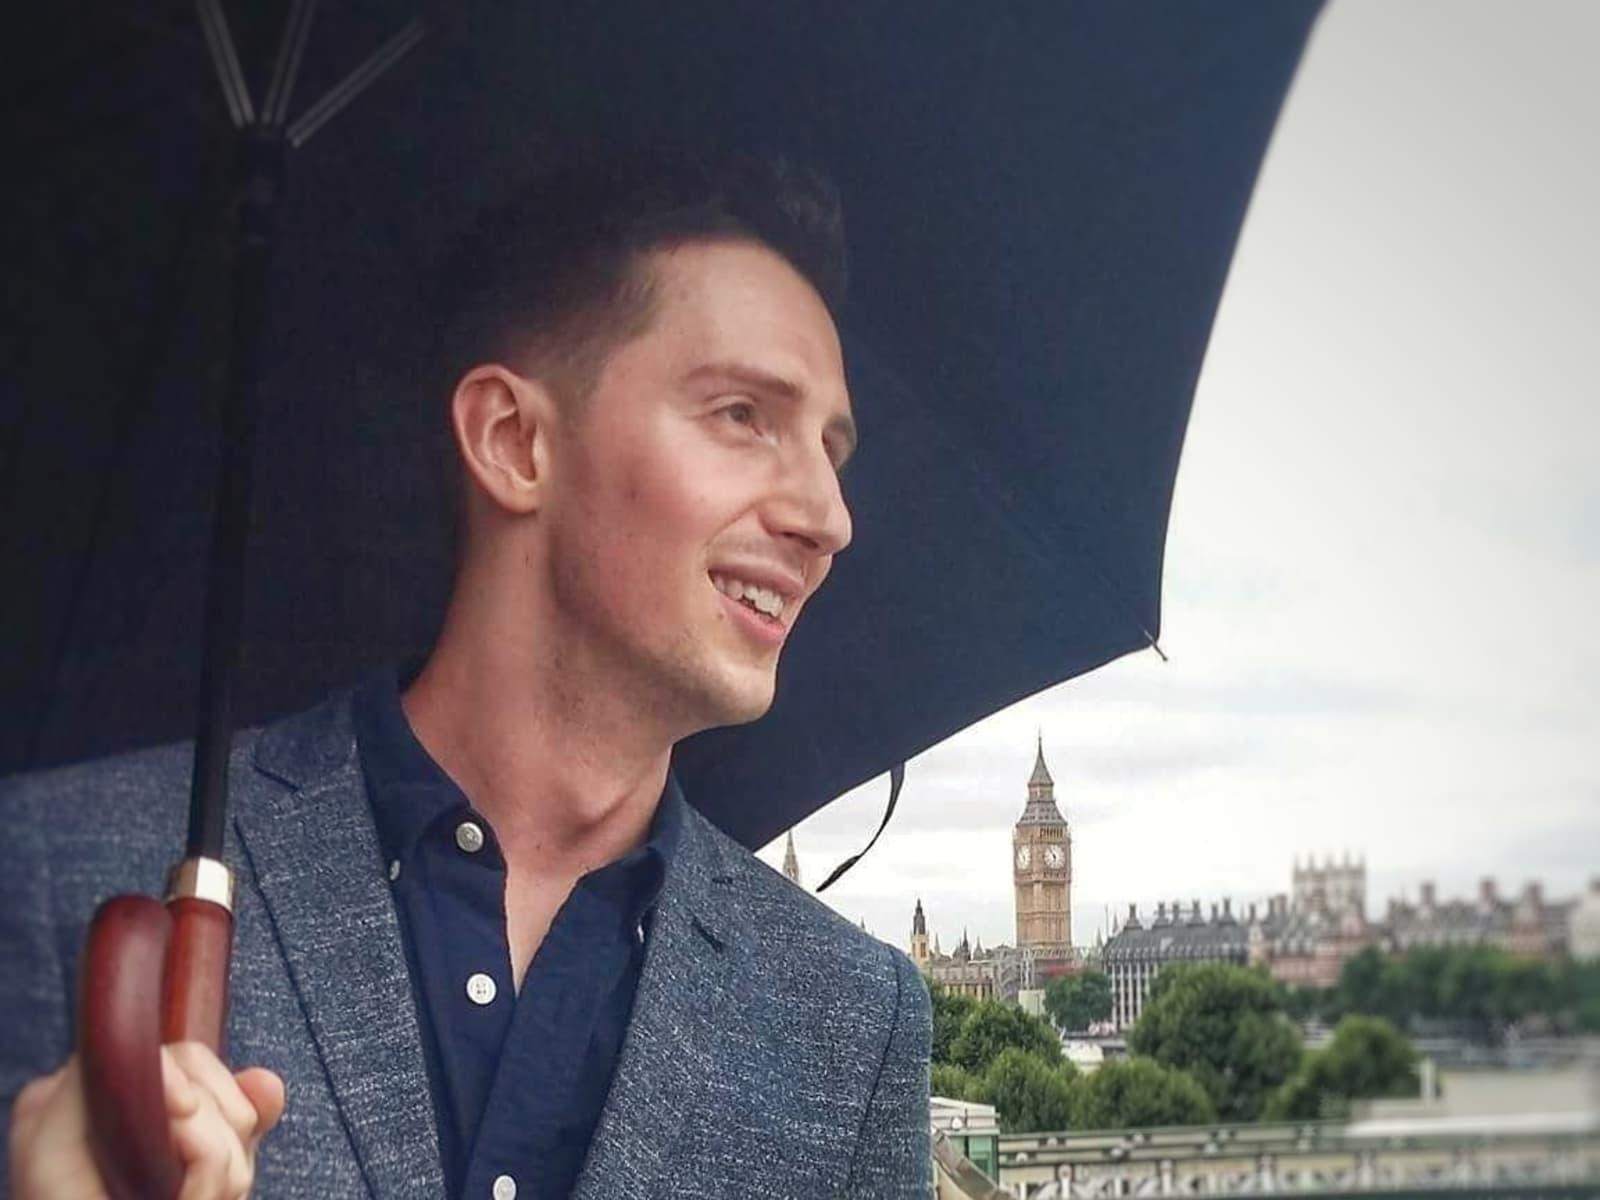 James from London, United Kingdom